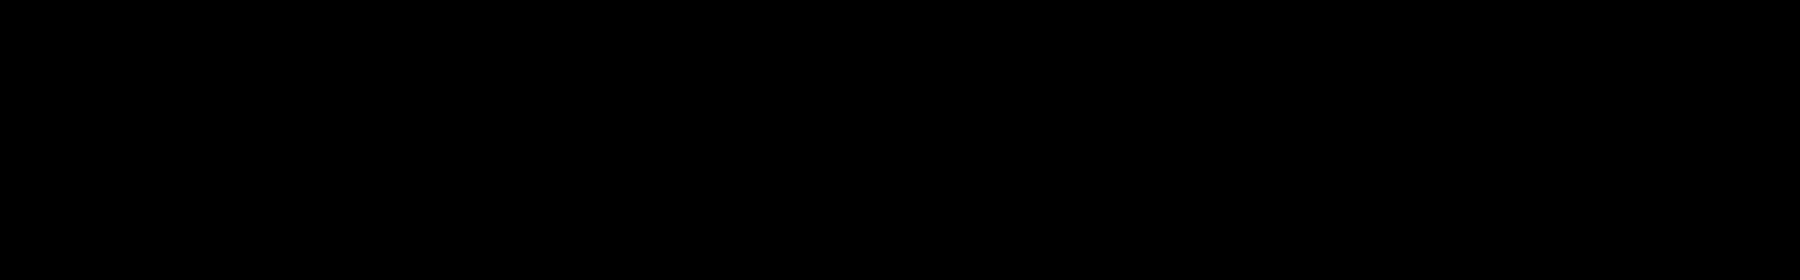 Arabian Cutz audio waveform